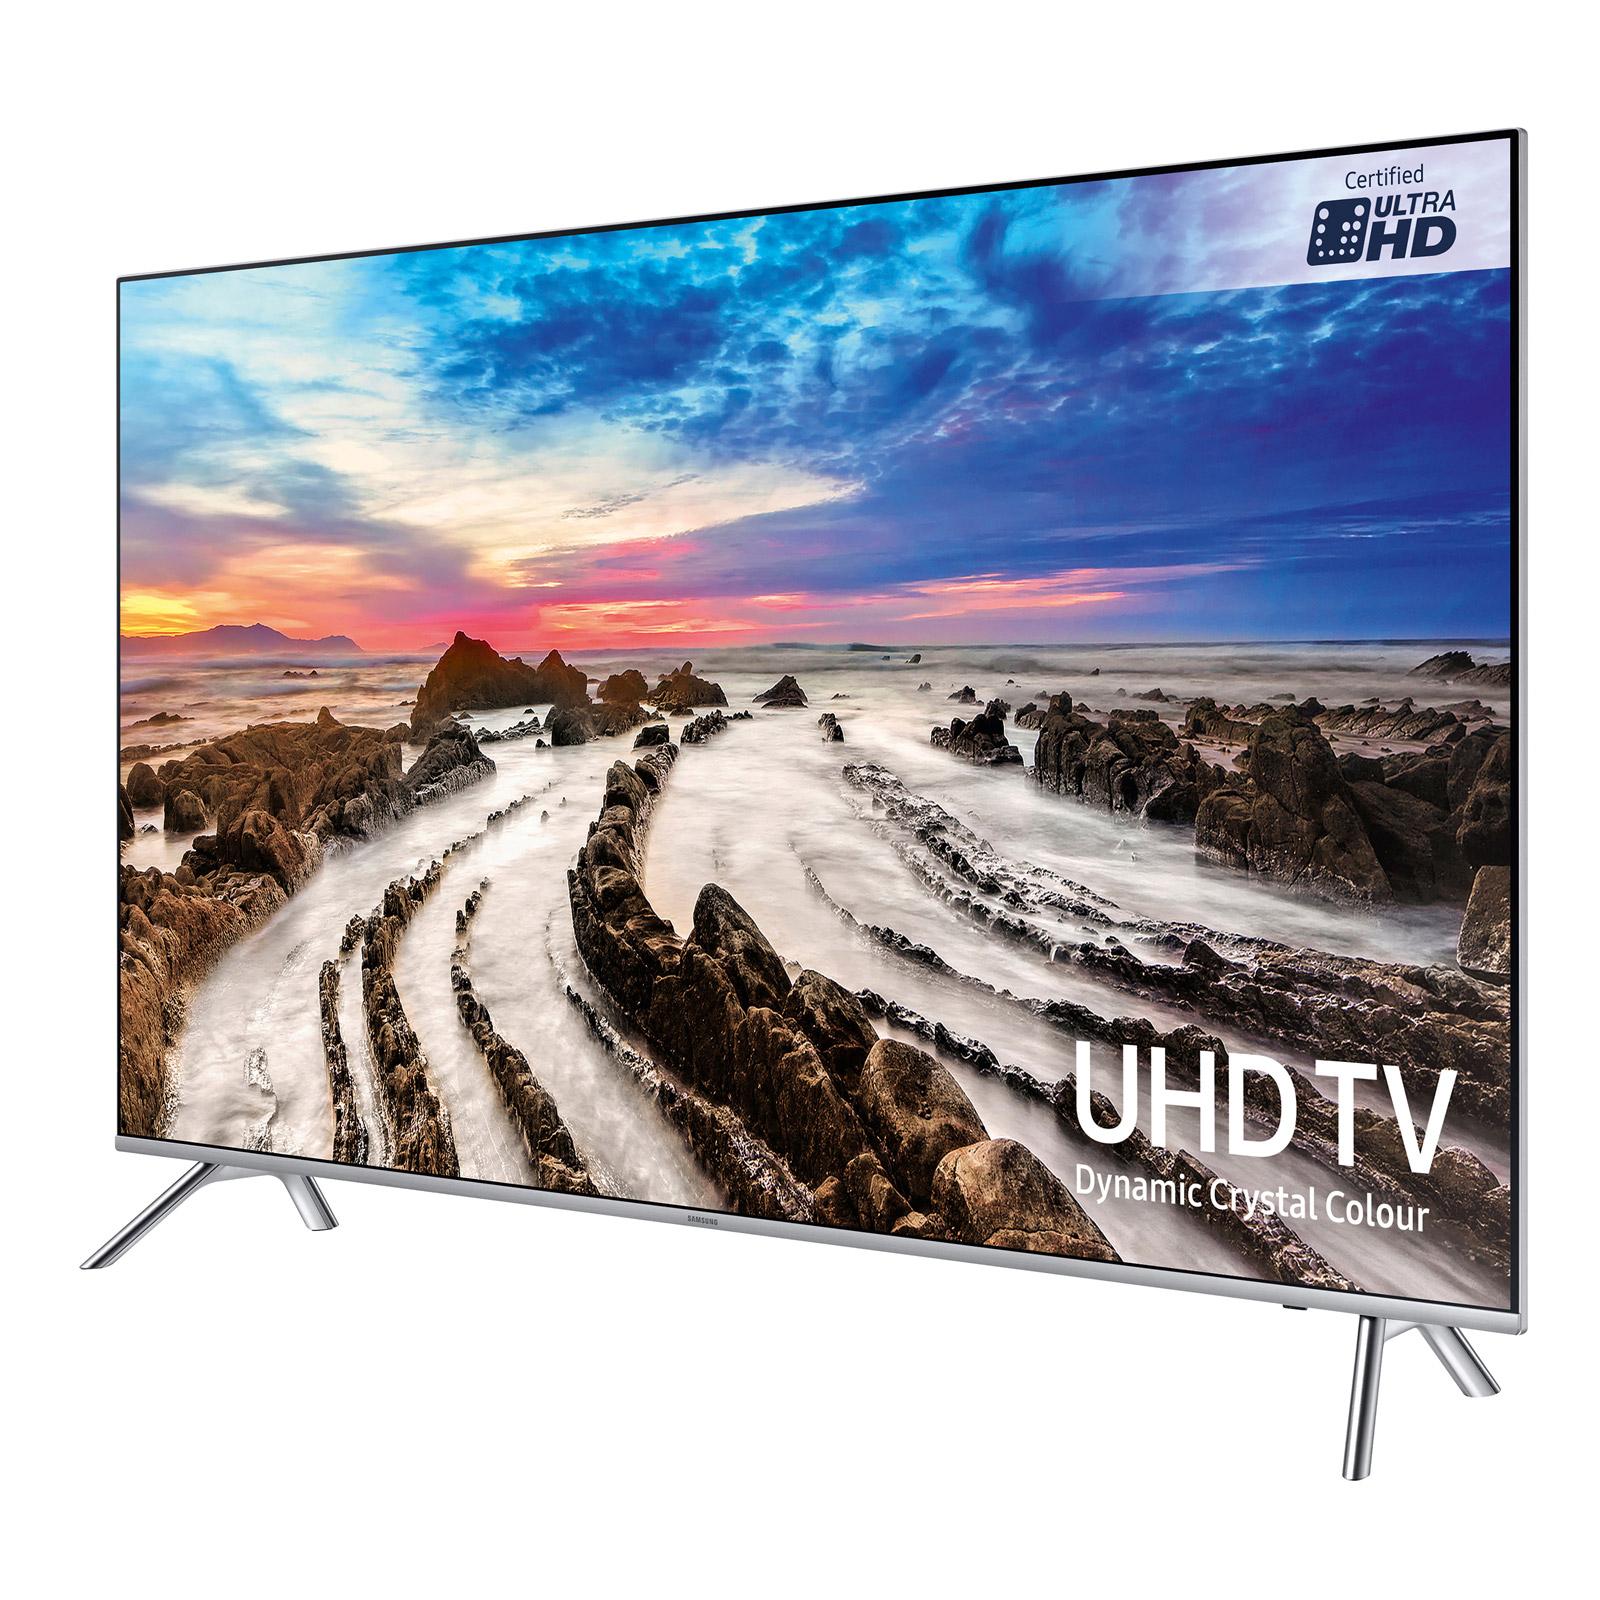 Samsung Series 7 UE49MU7000 @ PRCDirect - £619 - Best I've Seen!!